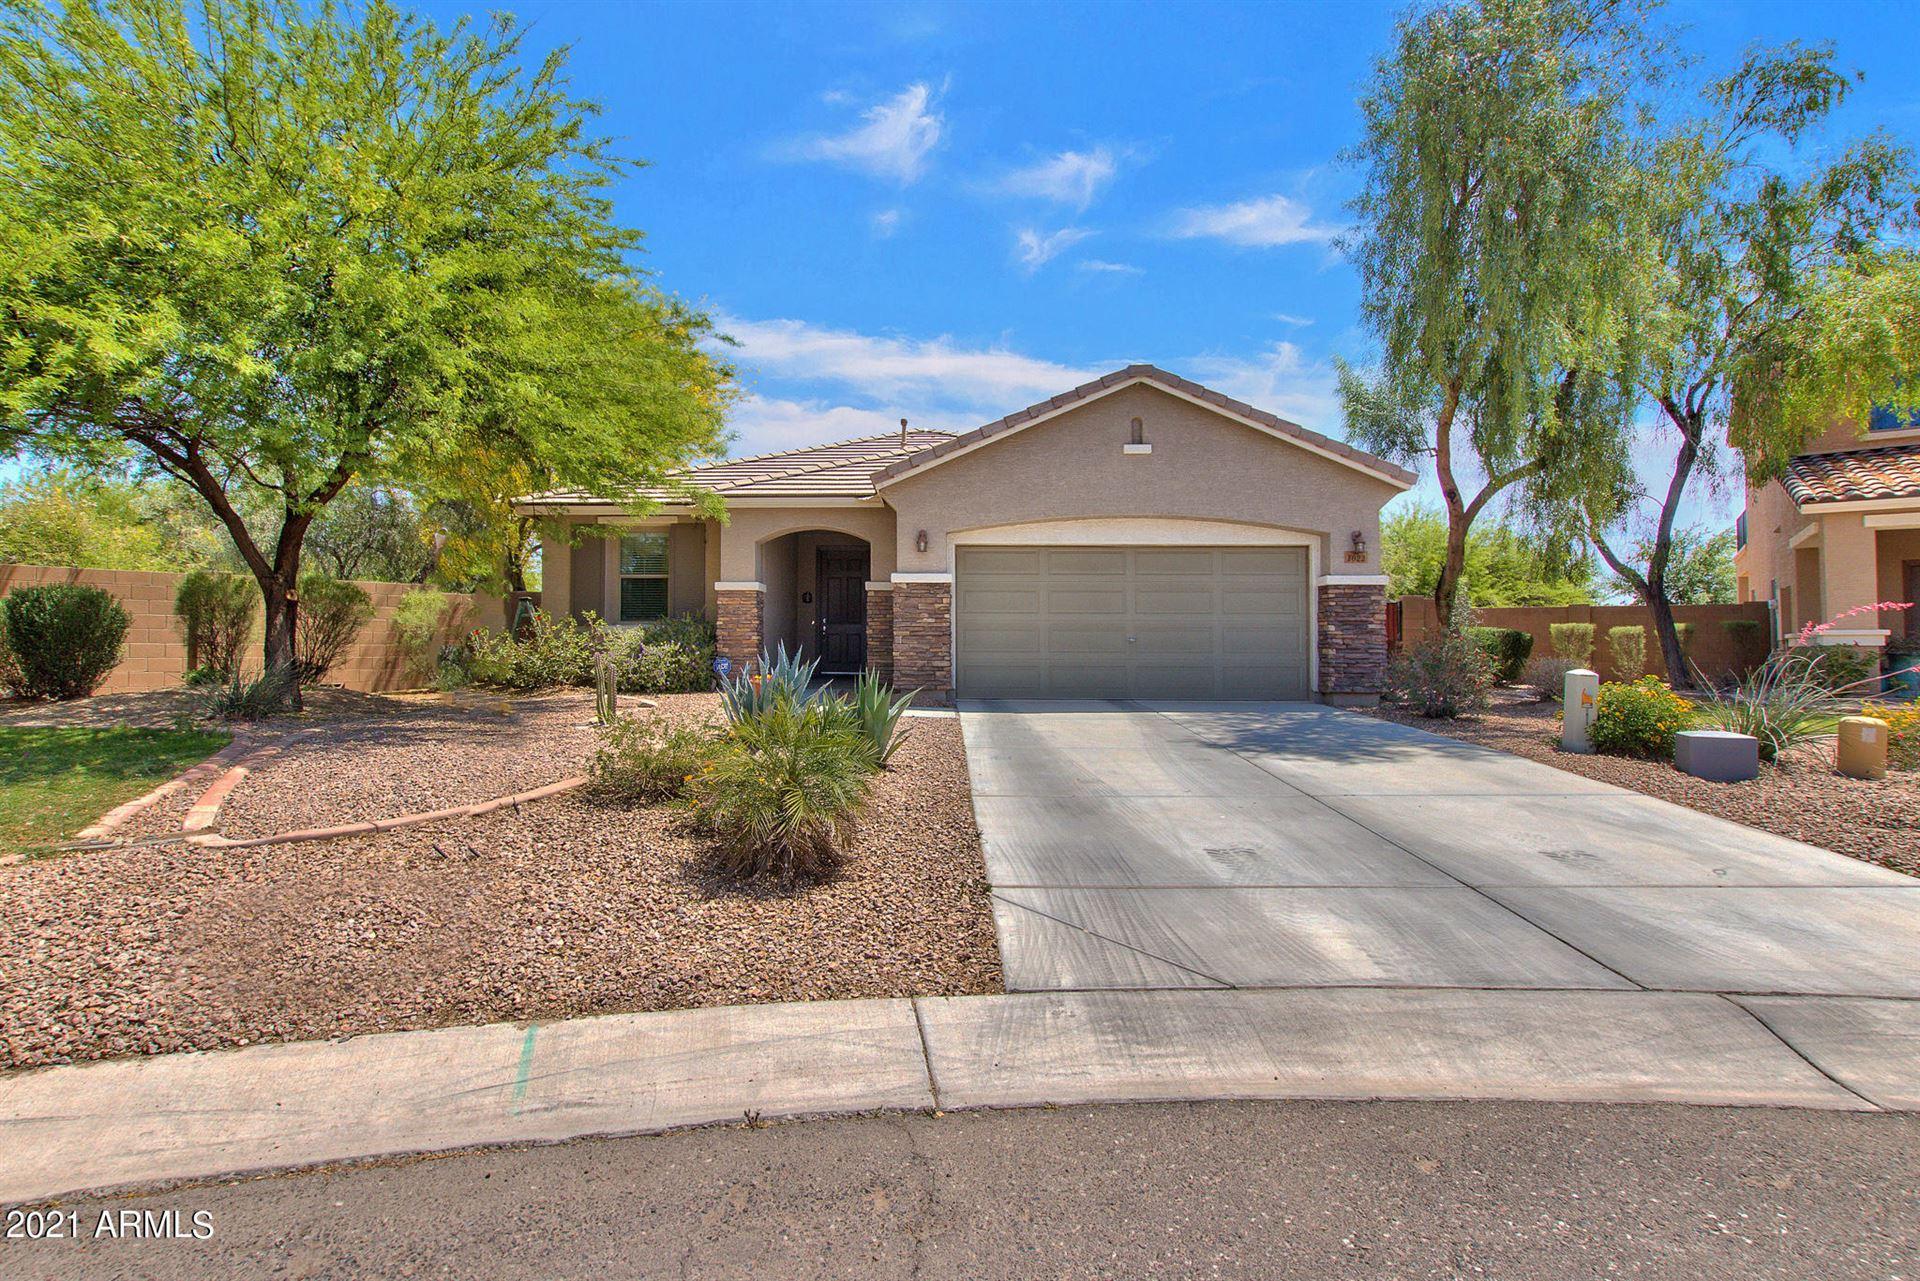 Photo of 1023 W STEPHANIE Lane, San Tan Valley, AZ 85143 (MLS # 6225210)